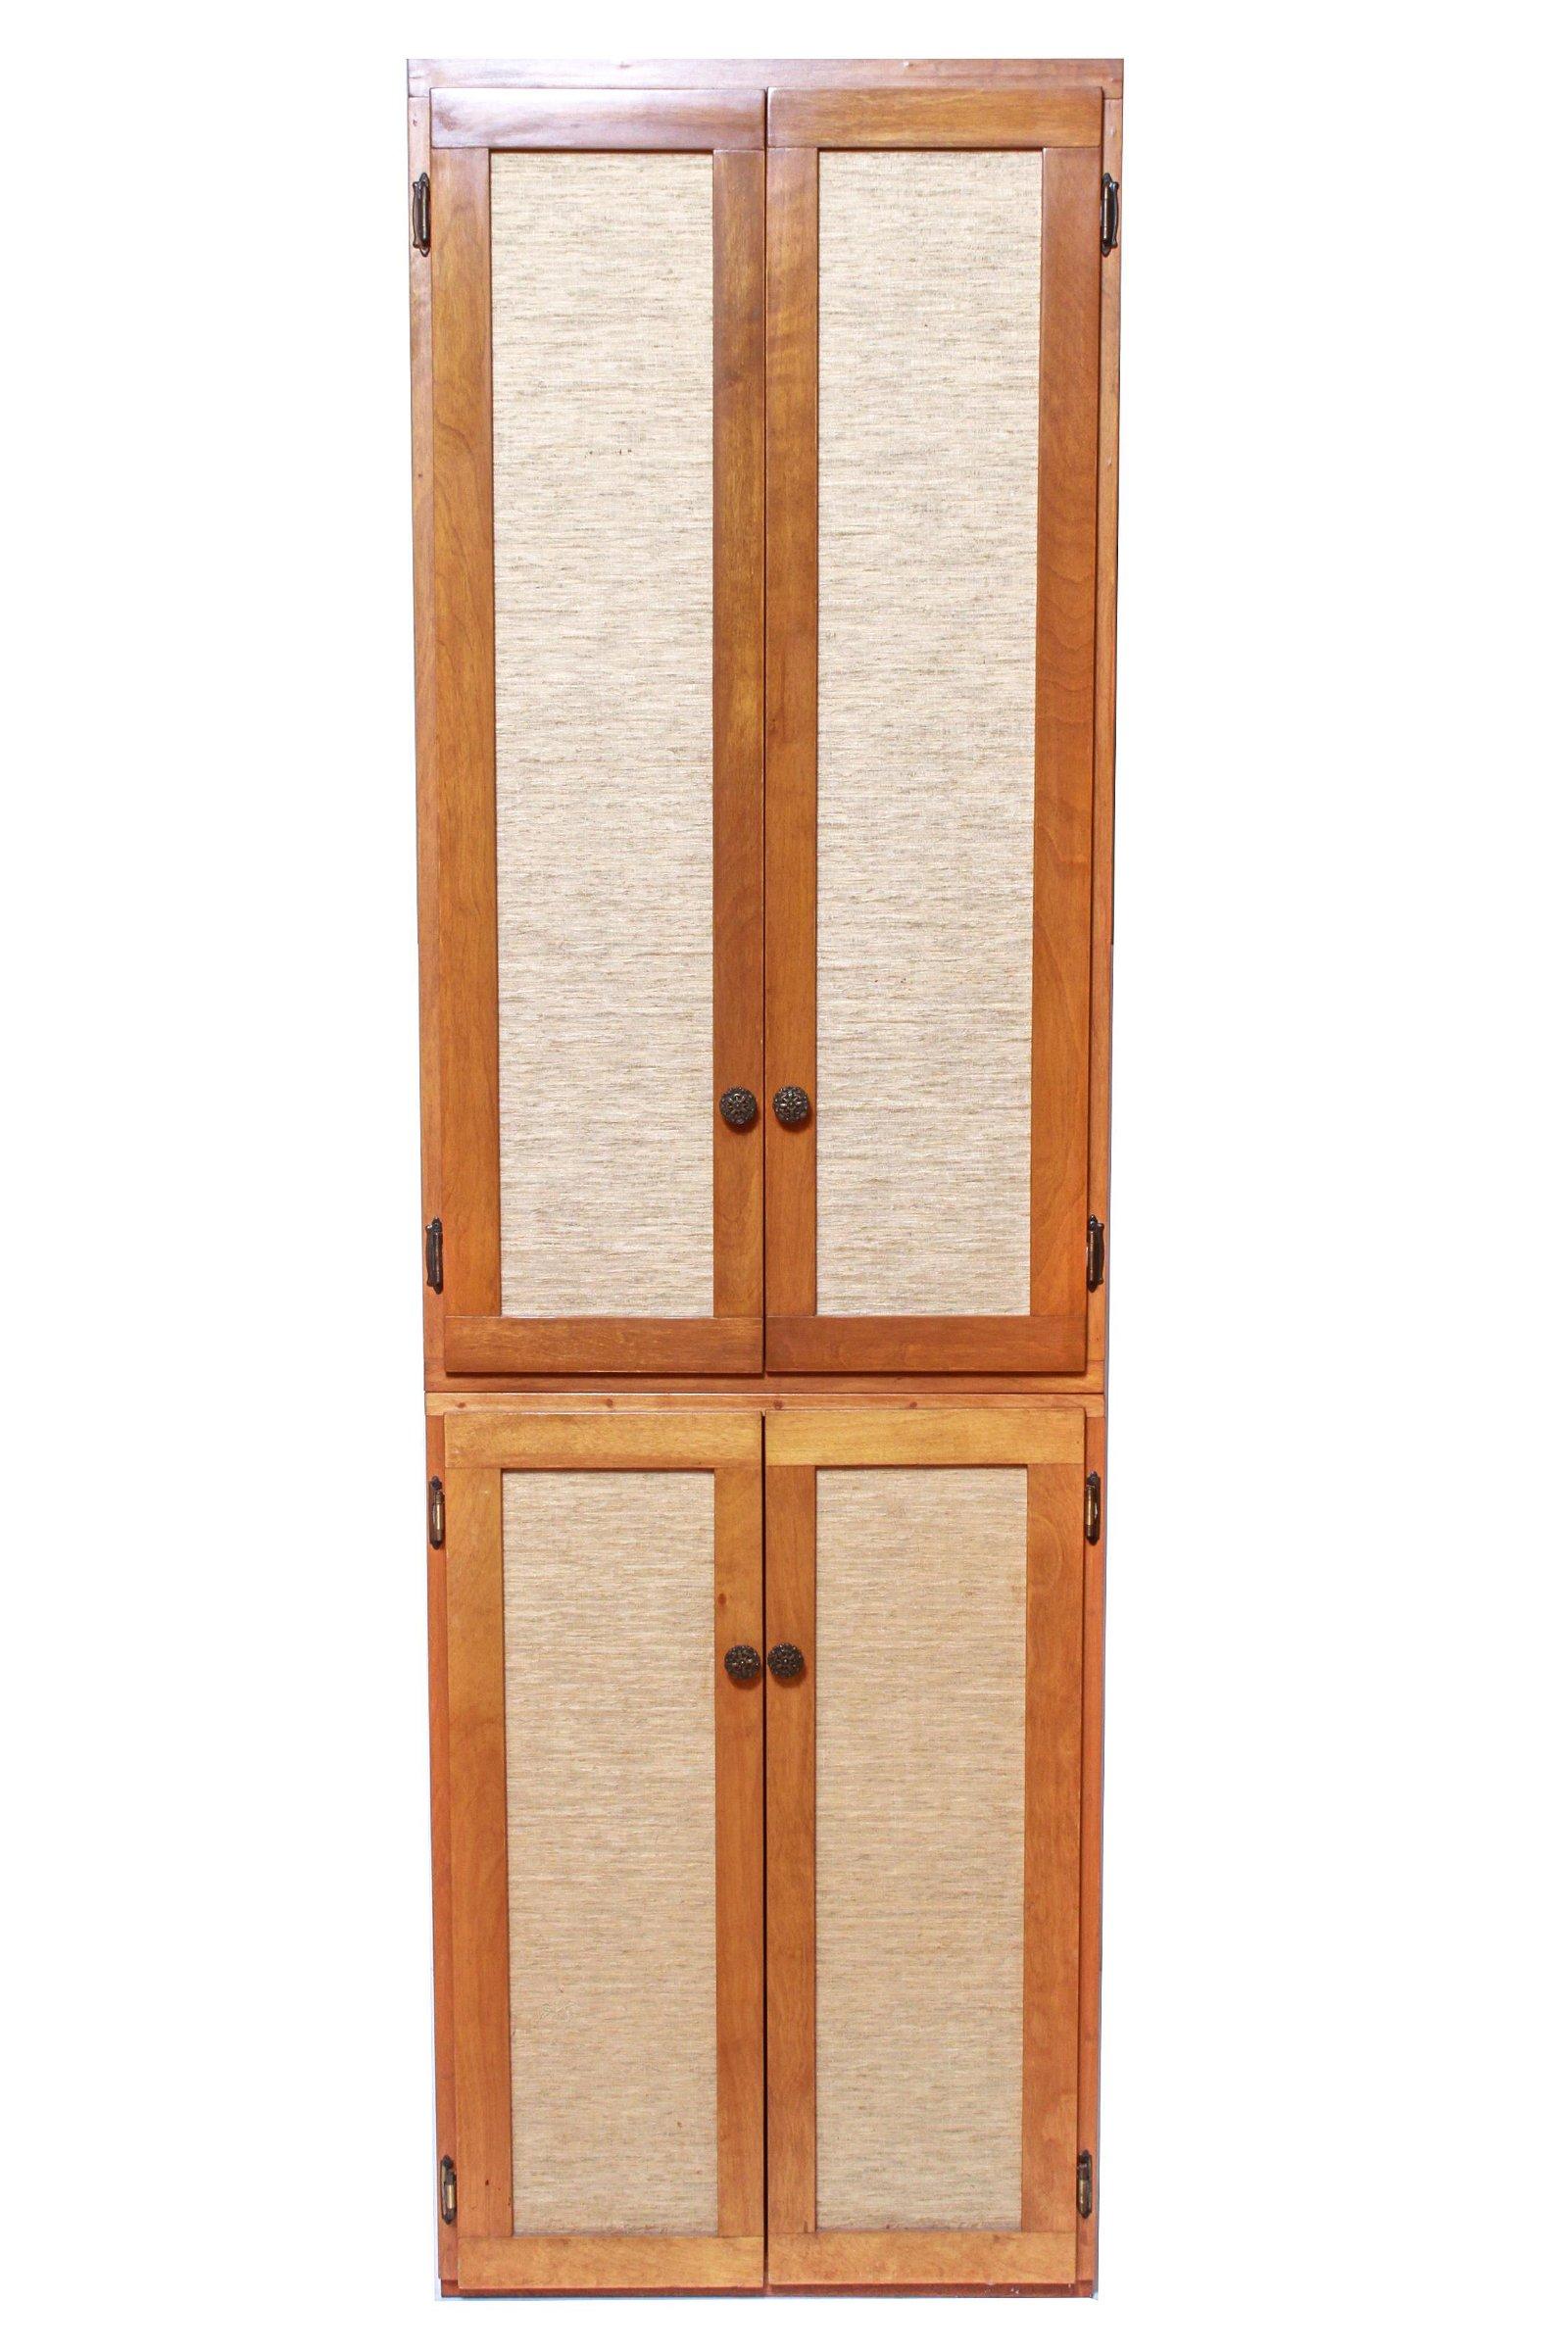 Mid-Century Modern Cabinet With Wicker Doors